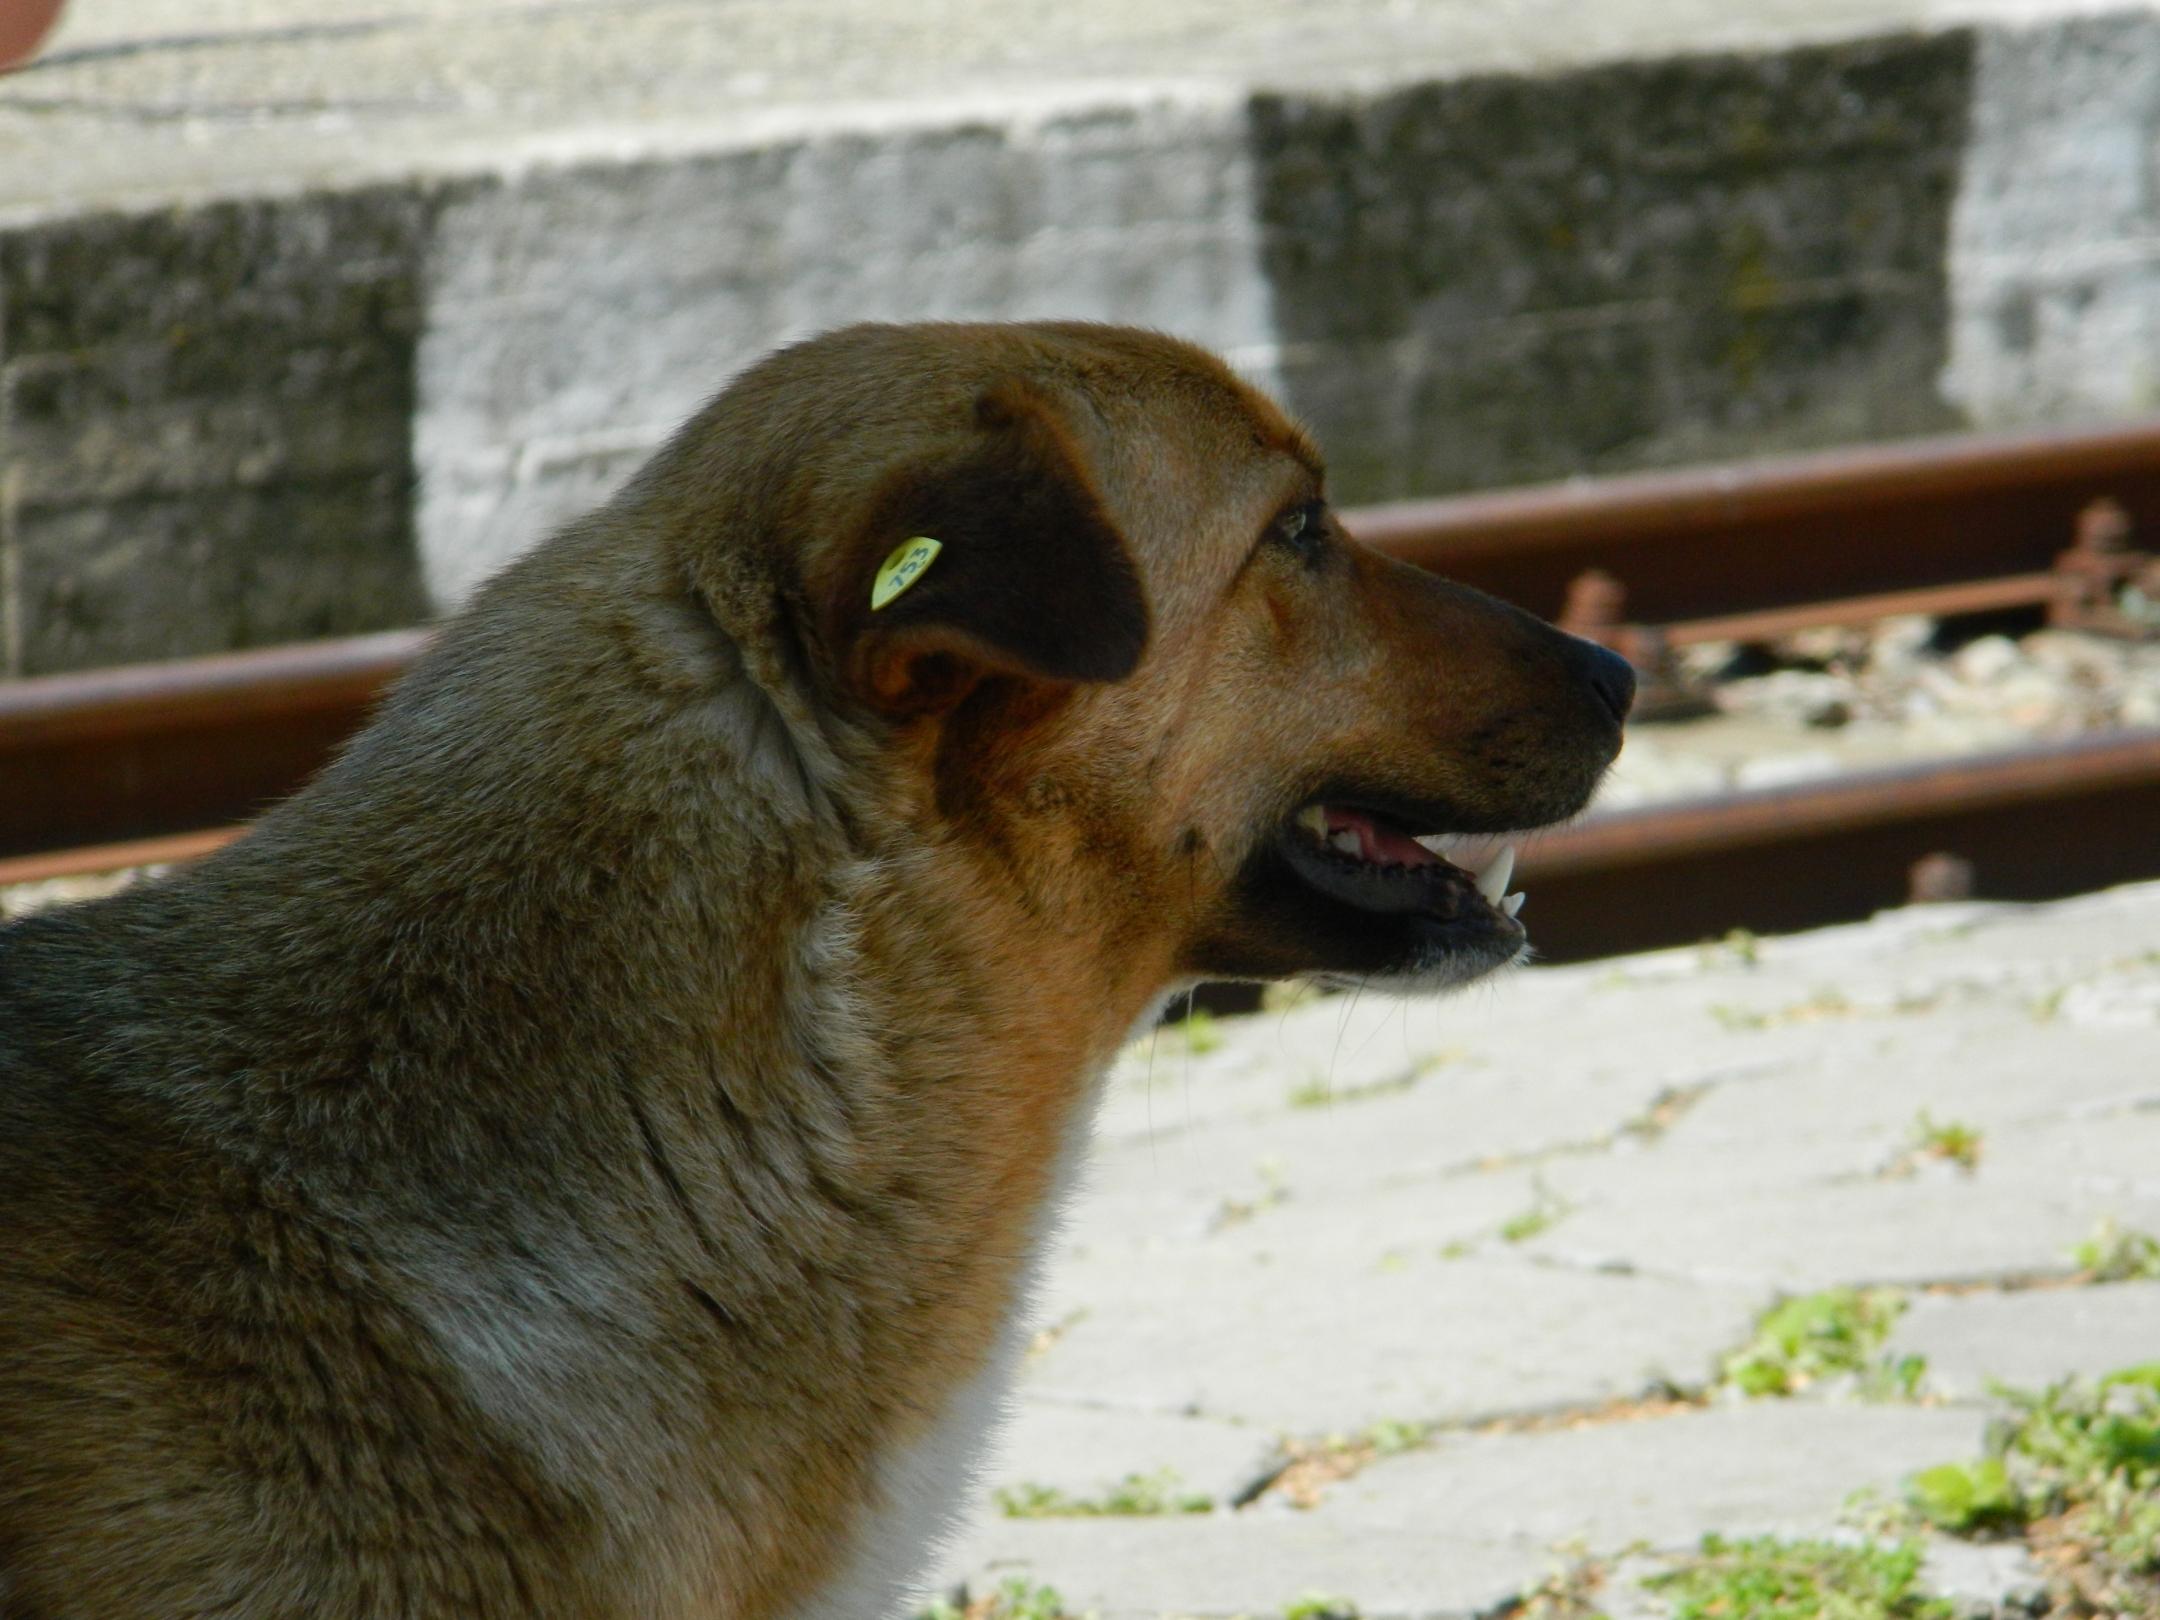 Dog Head, Animal, Dog, Head, Pet, HQ Photo